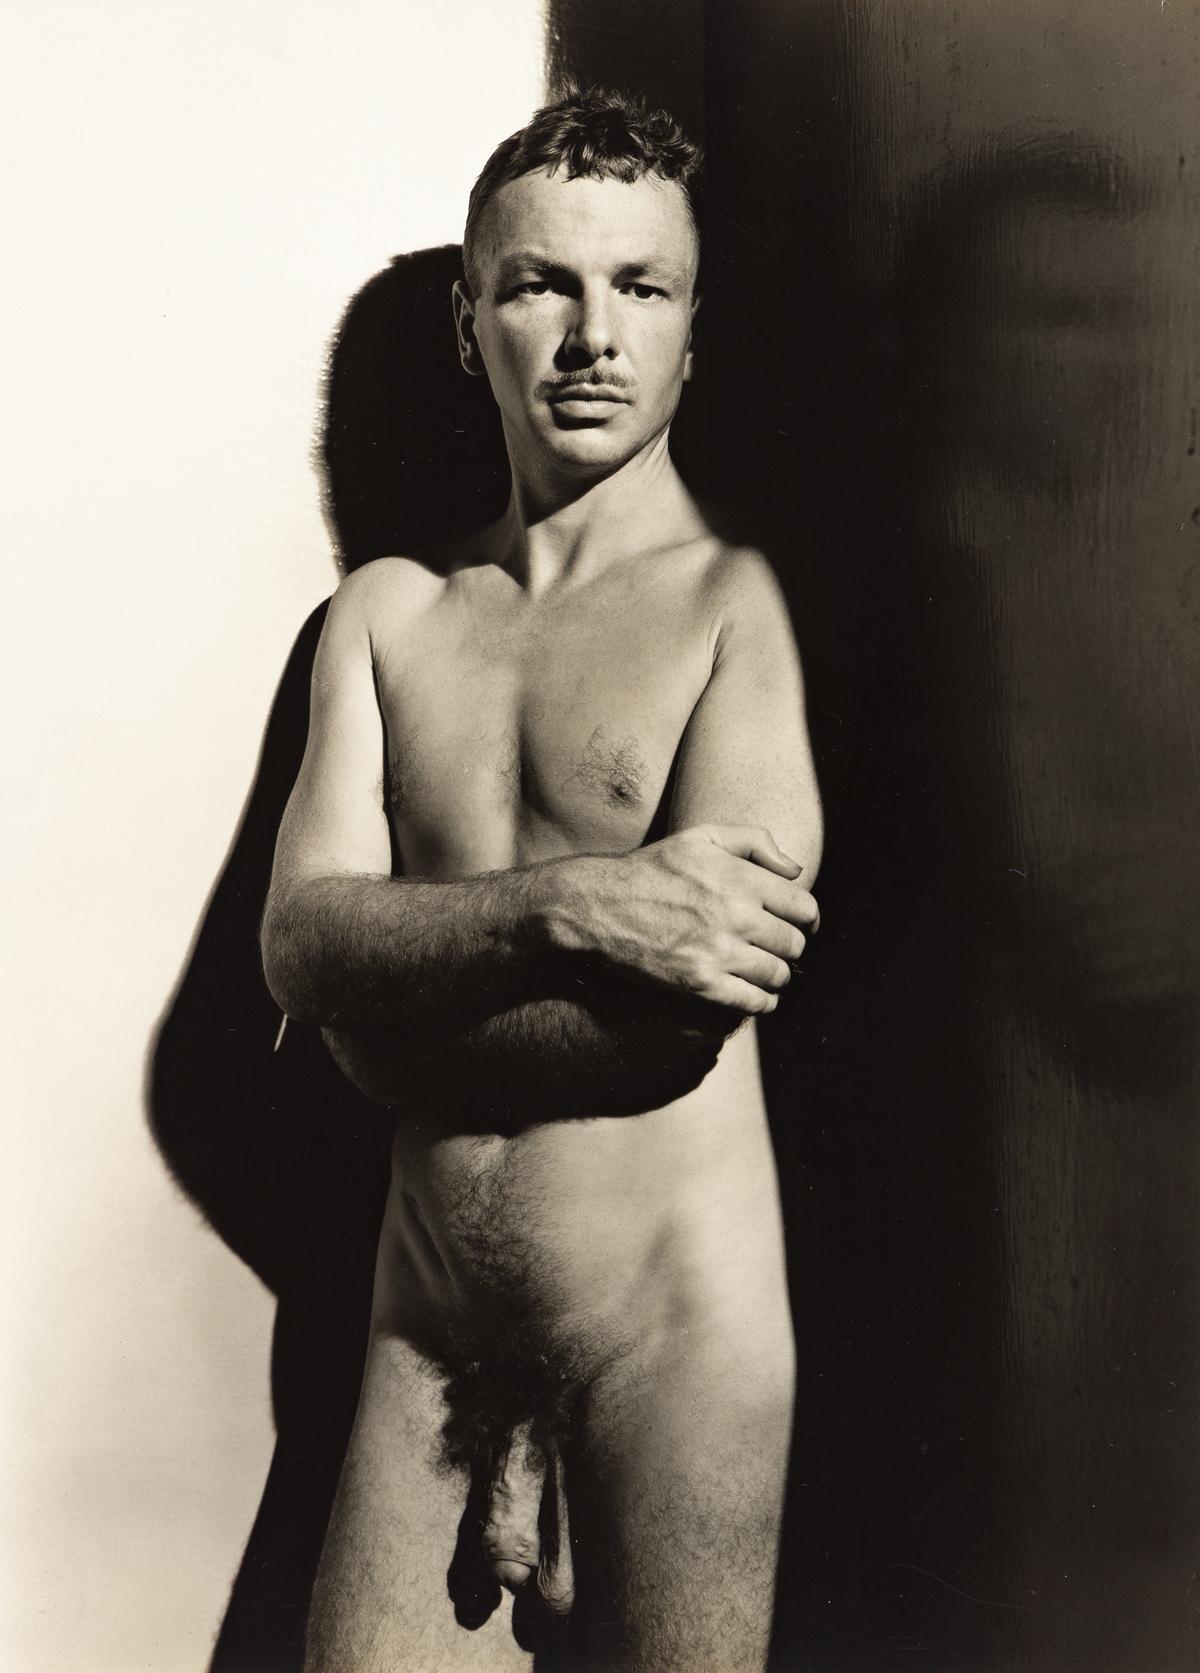 GEORGE PLATT LYNES (1907-1955) Jared French.